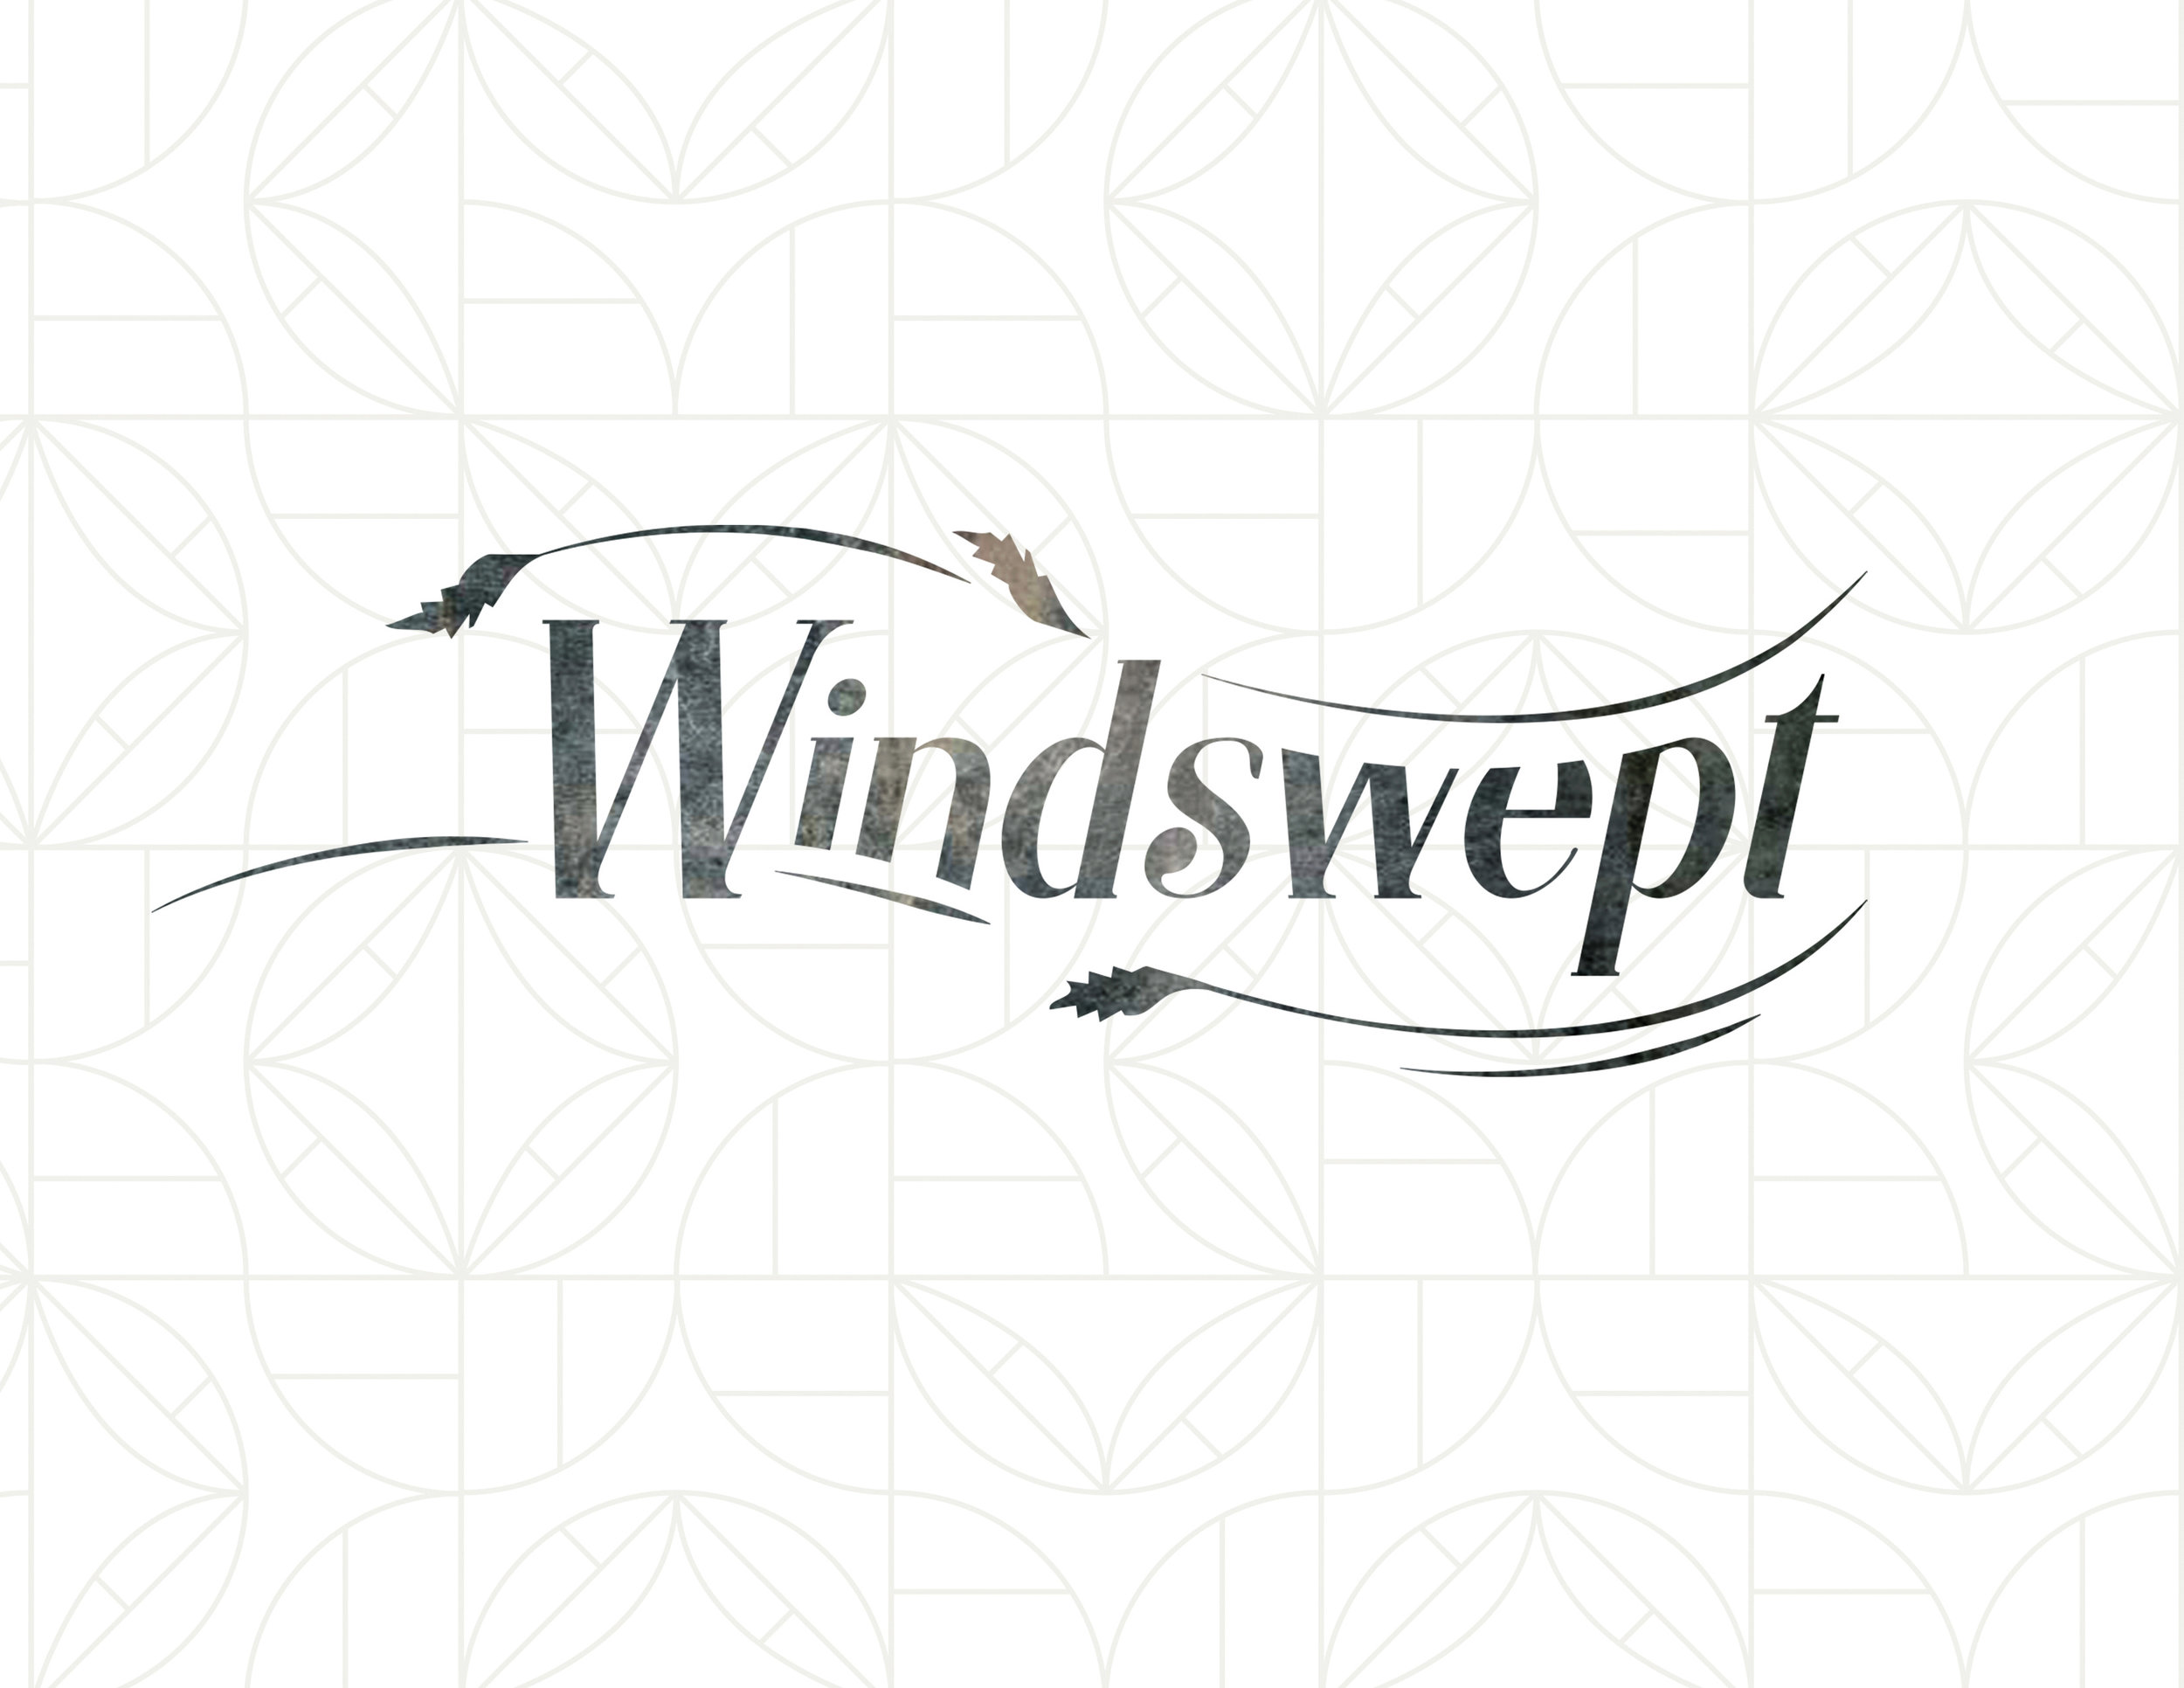 Windswept 1.jpg